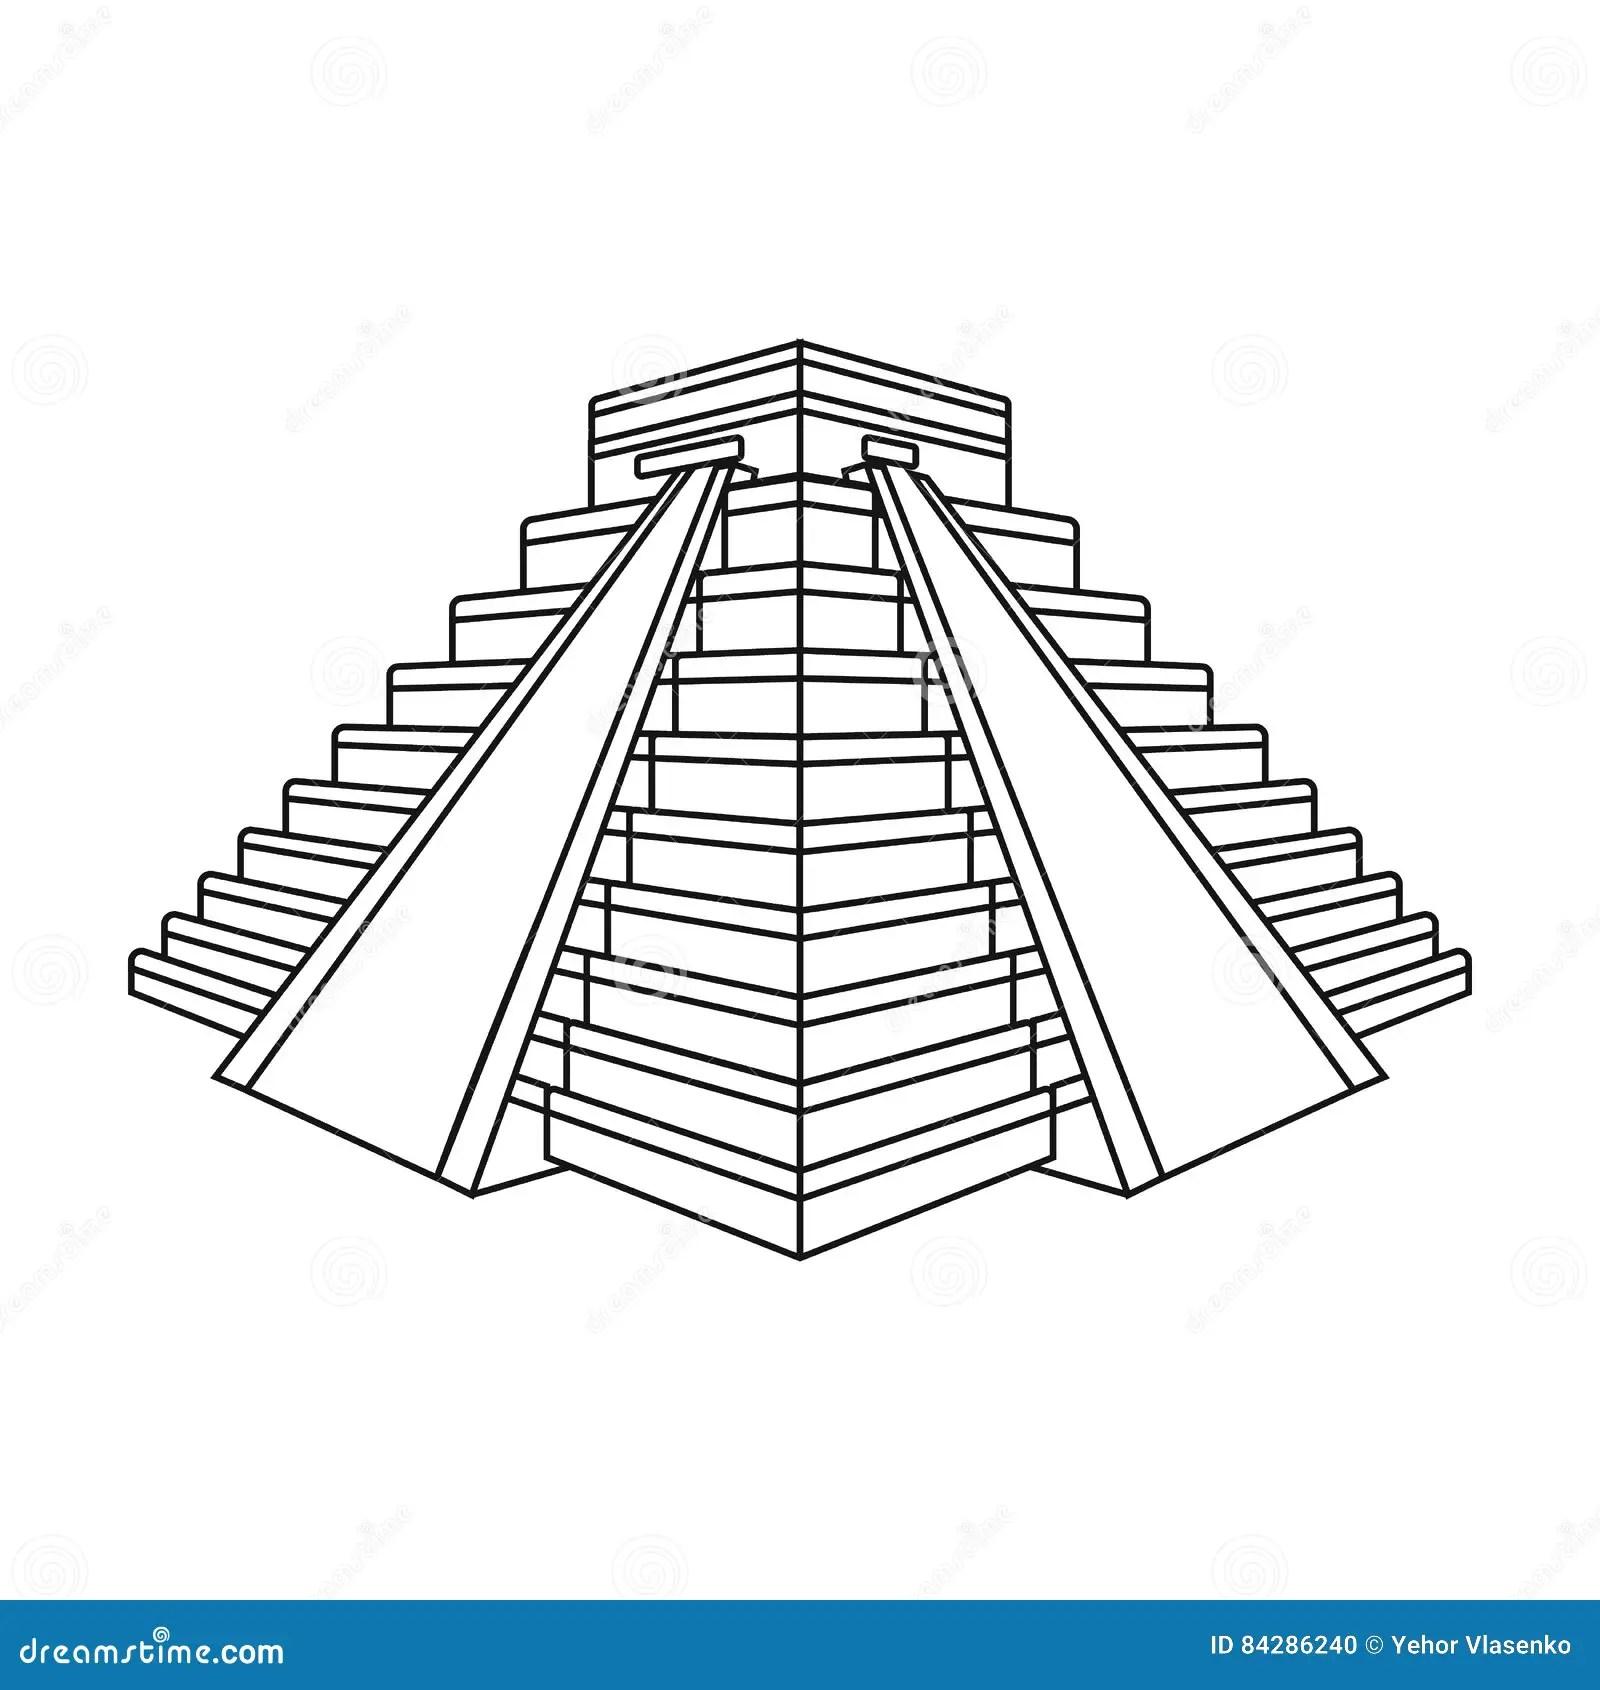 Mayan Pyramid Coloring Page Sketch Coloring Page